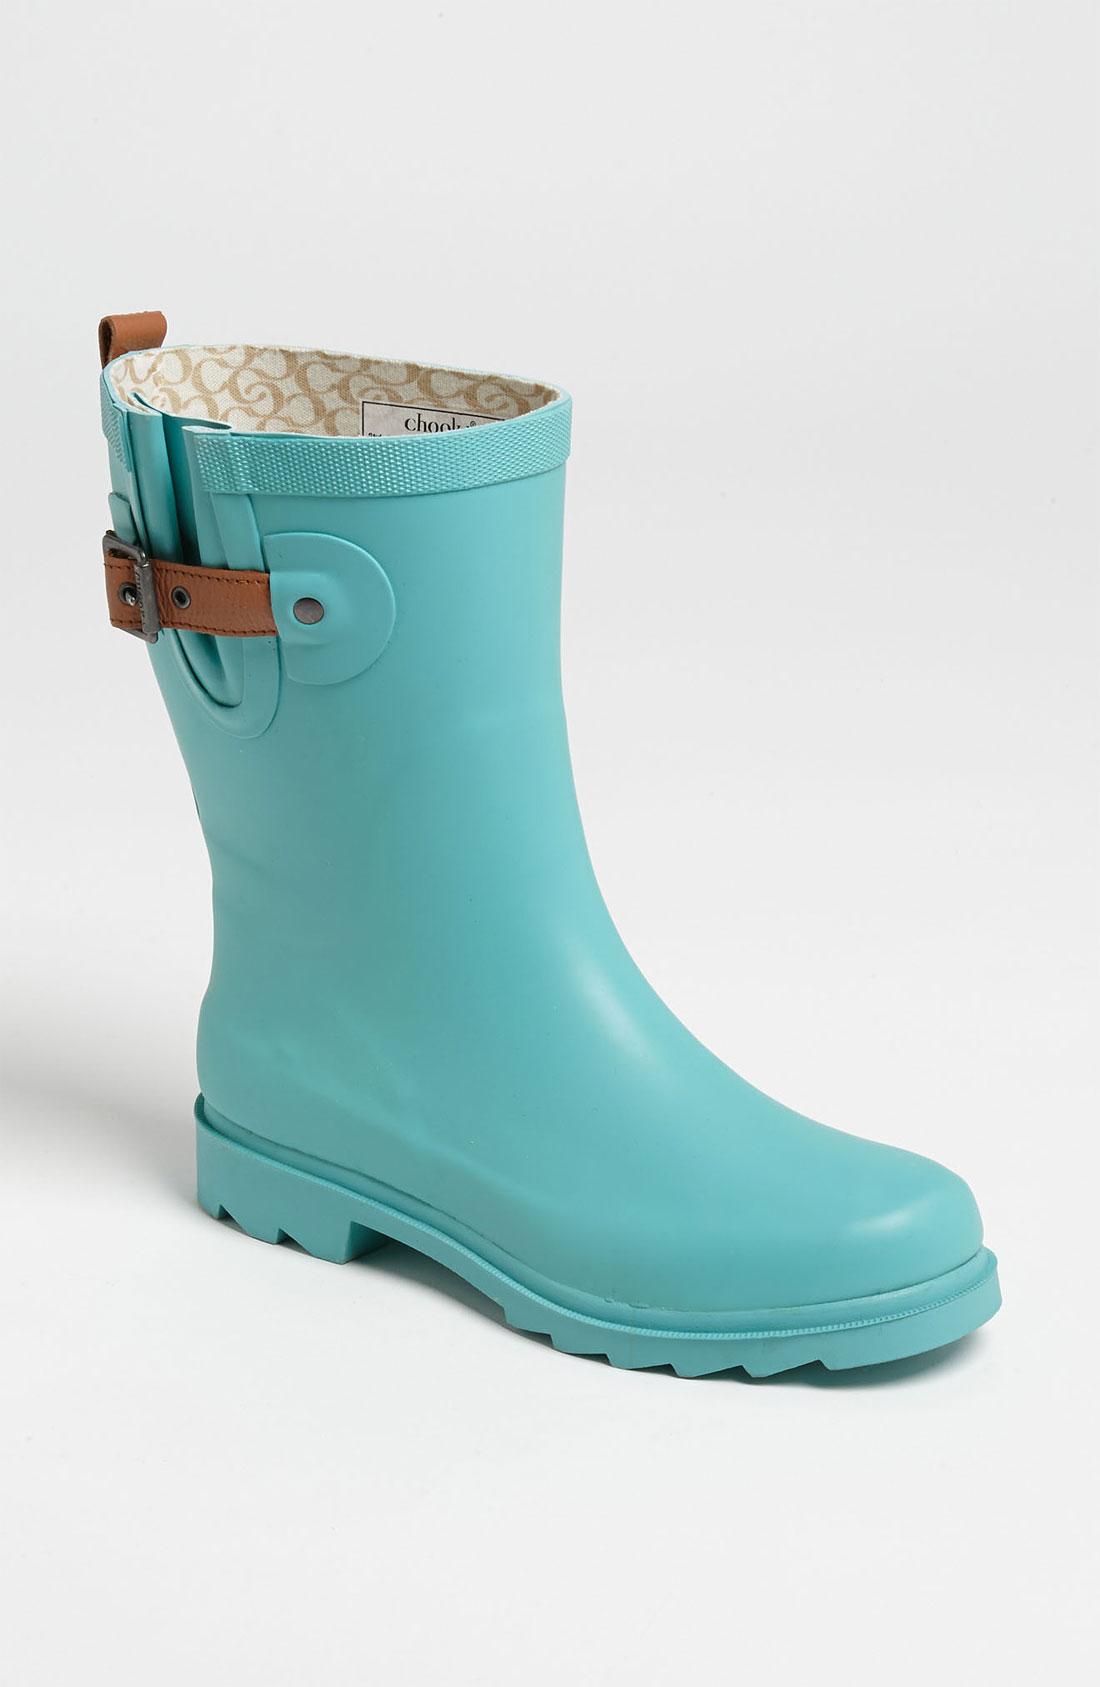 Perfect Women39s Beige Housecheck Rubber Rain Boots  Overstock Shopping  Top